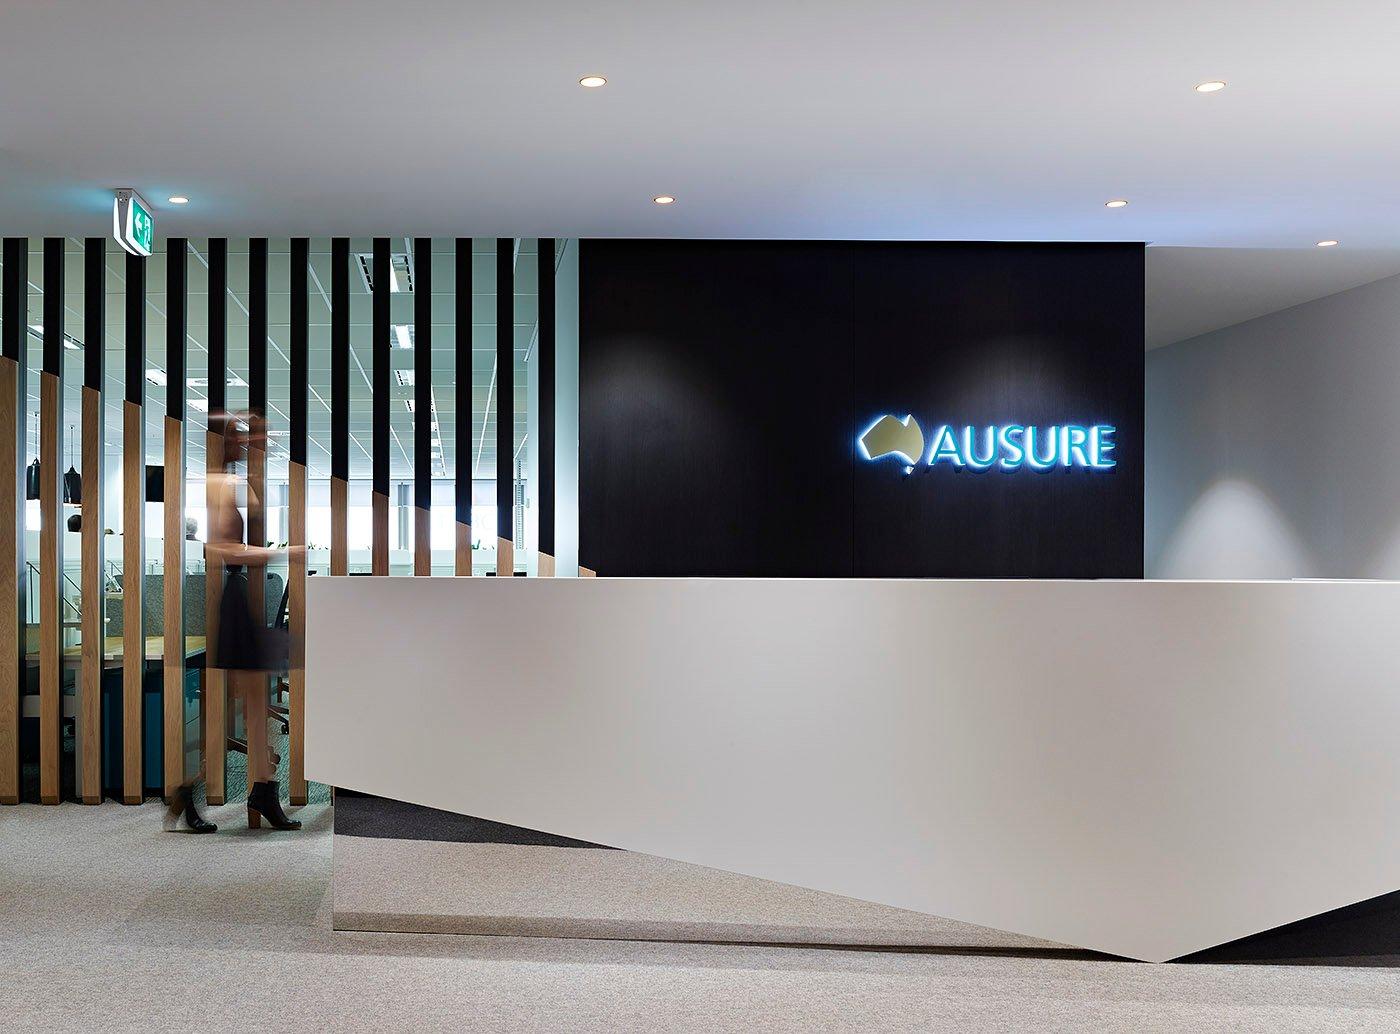 Ausure Brisbane Tenant Representation, Interior Design, Project & Construction Management Project Image 3 by PCG